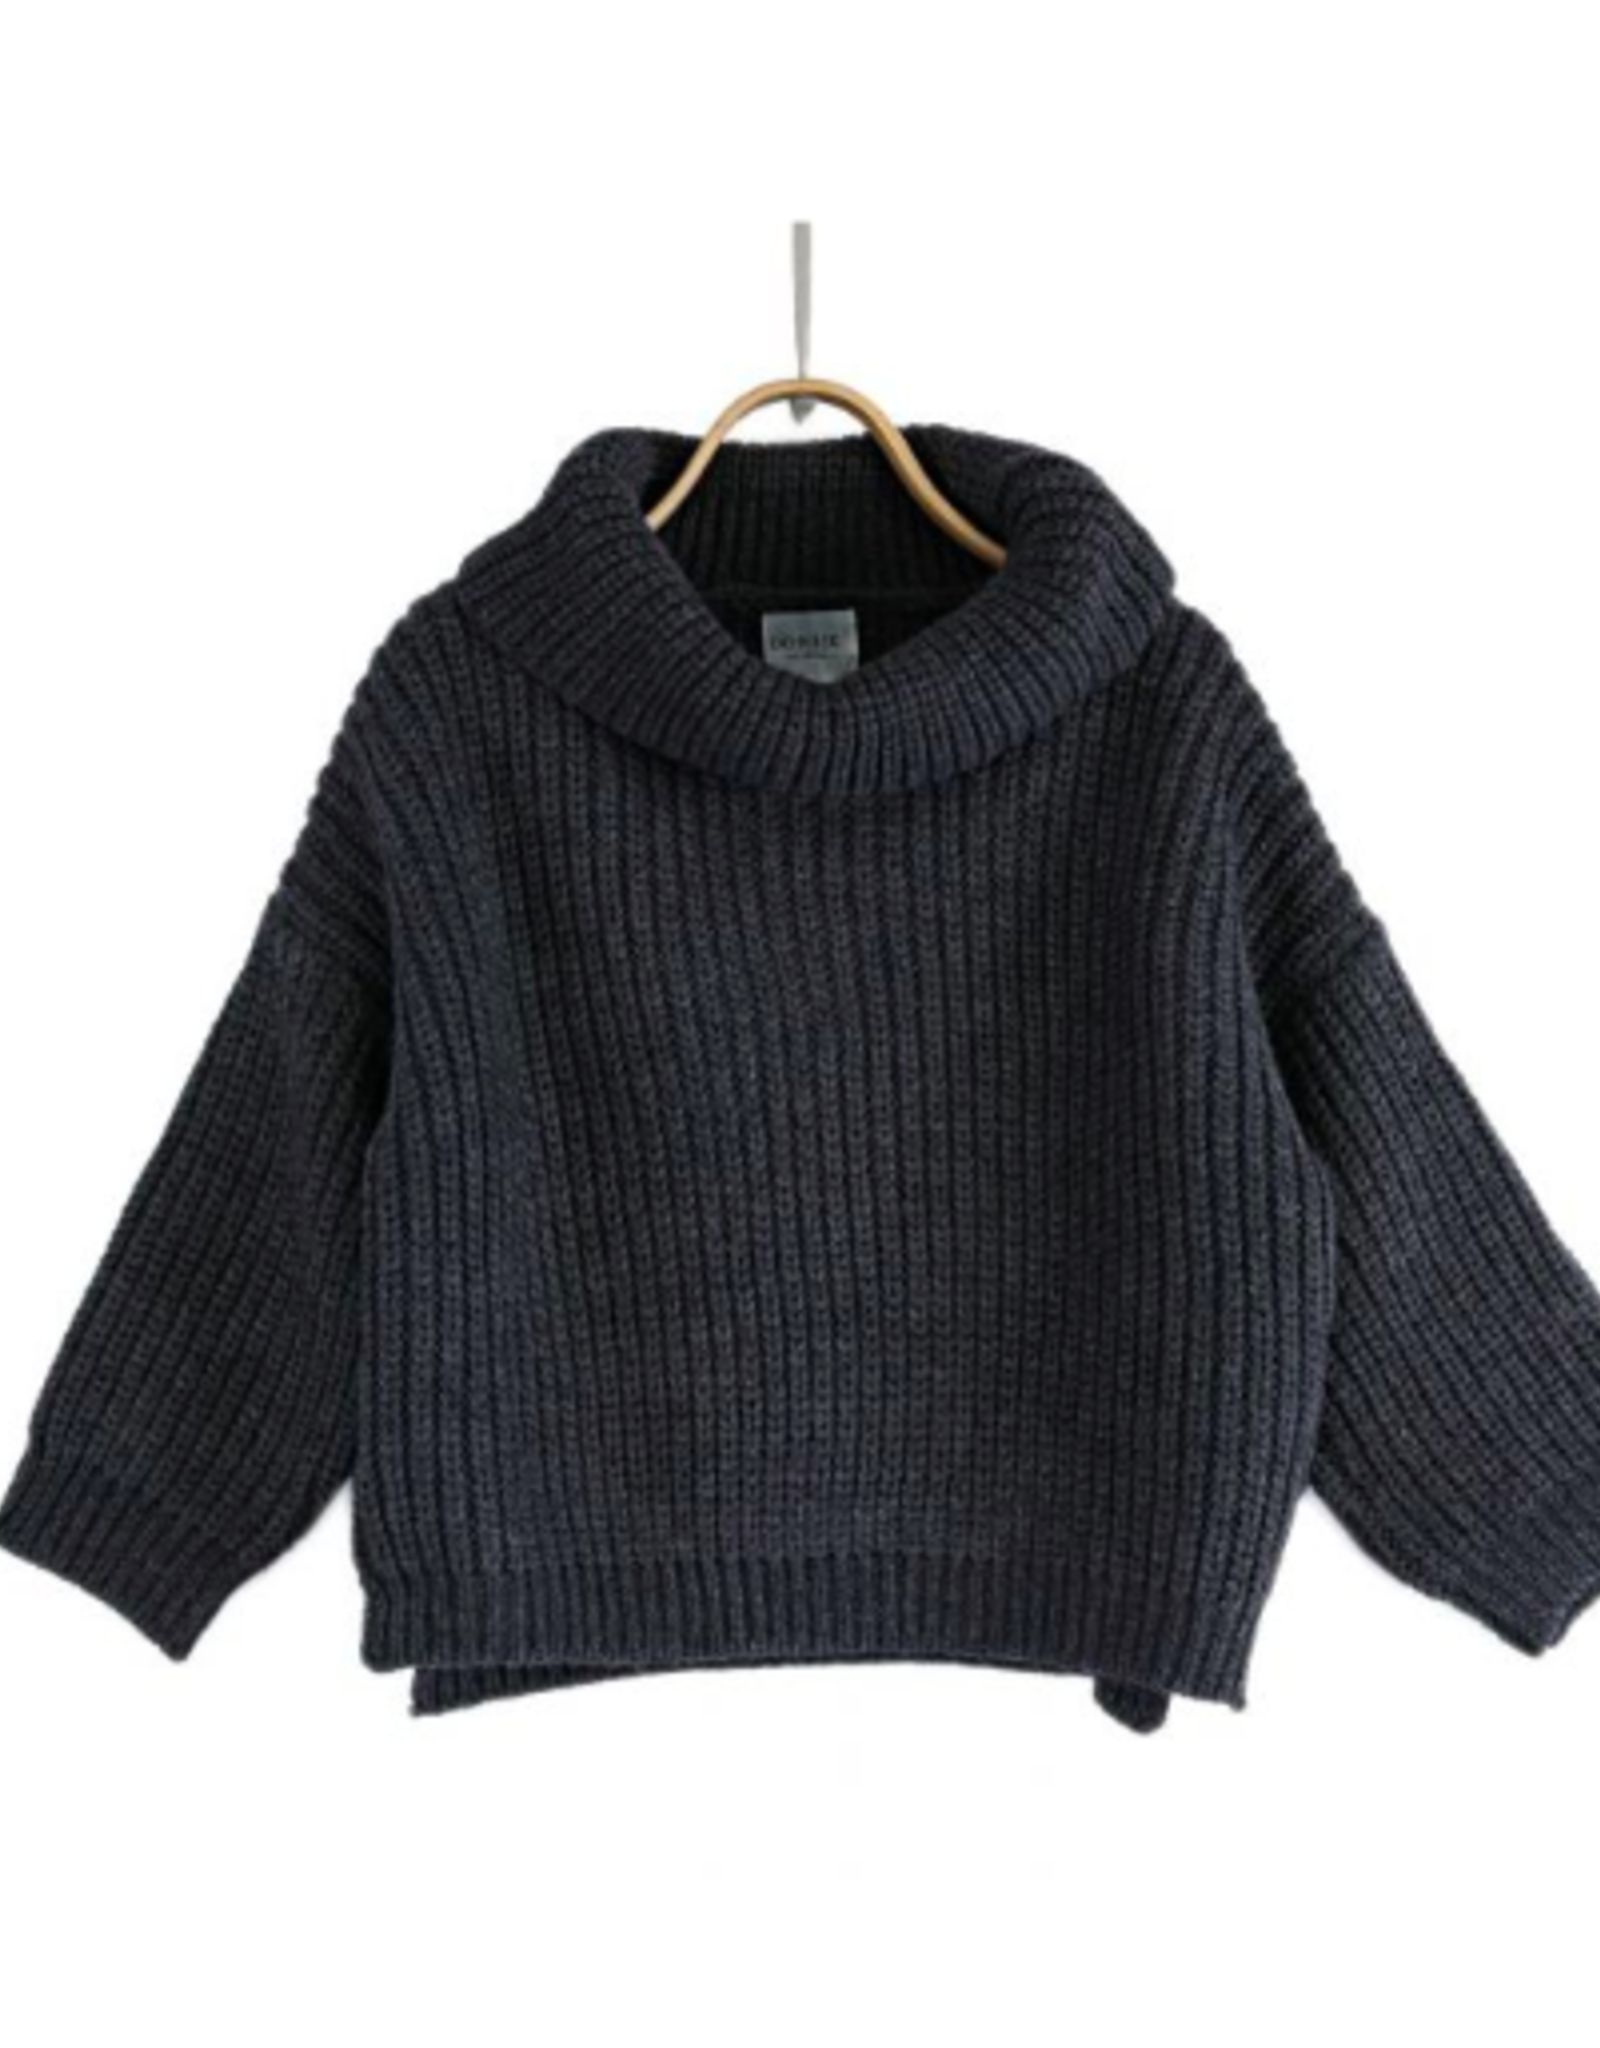 Donsje Yara sweater